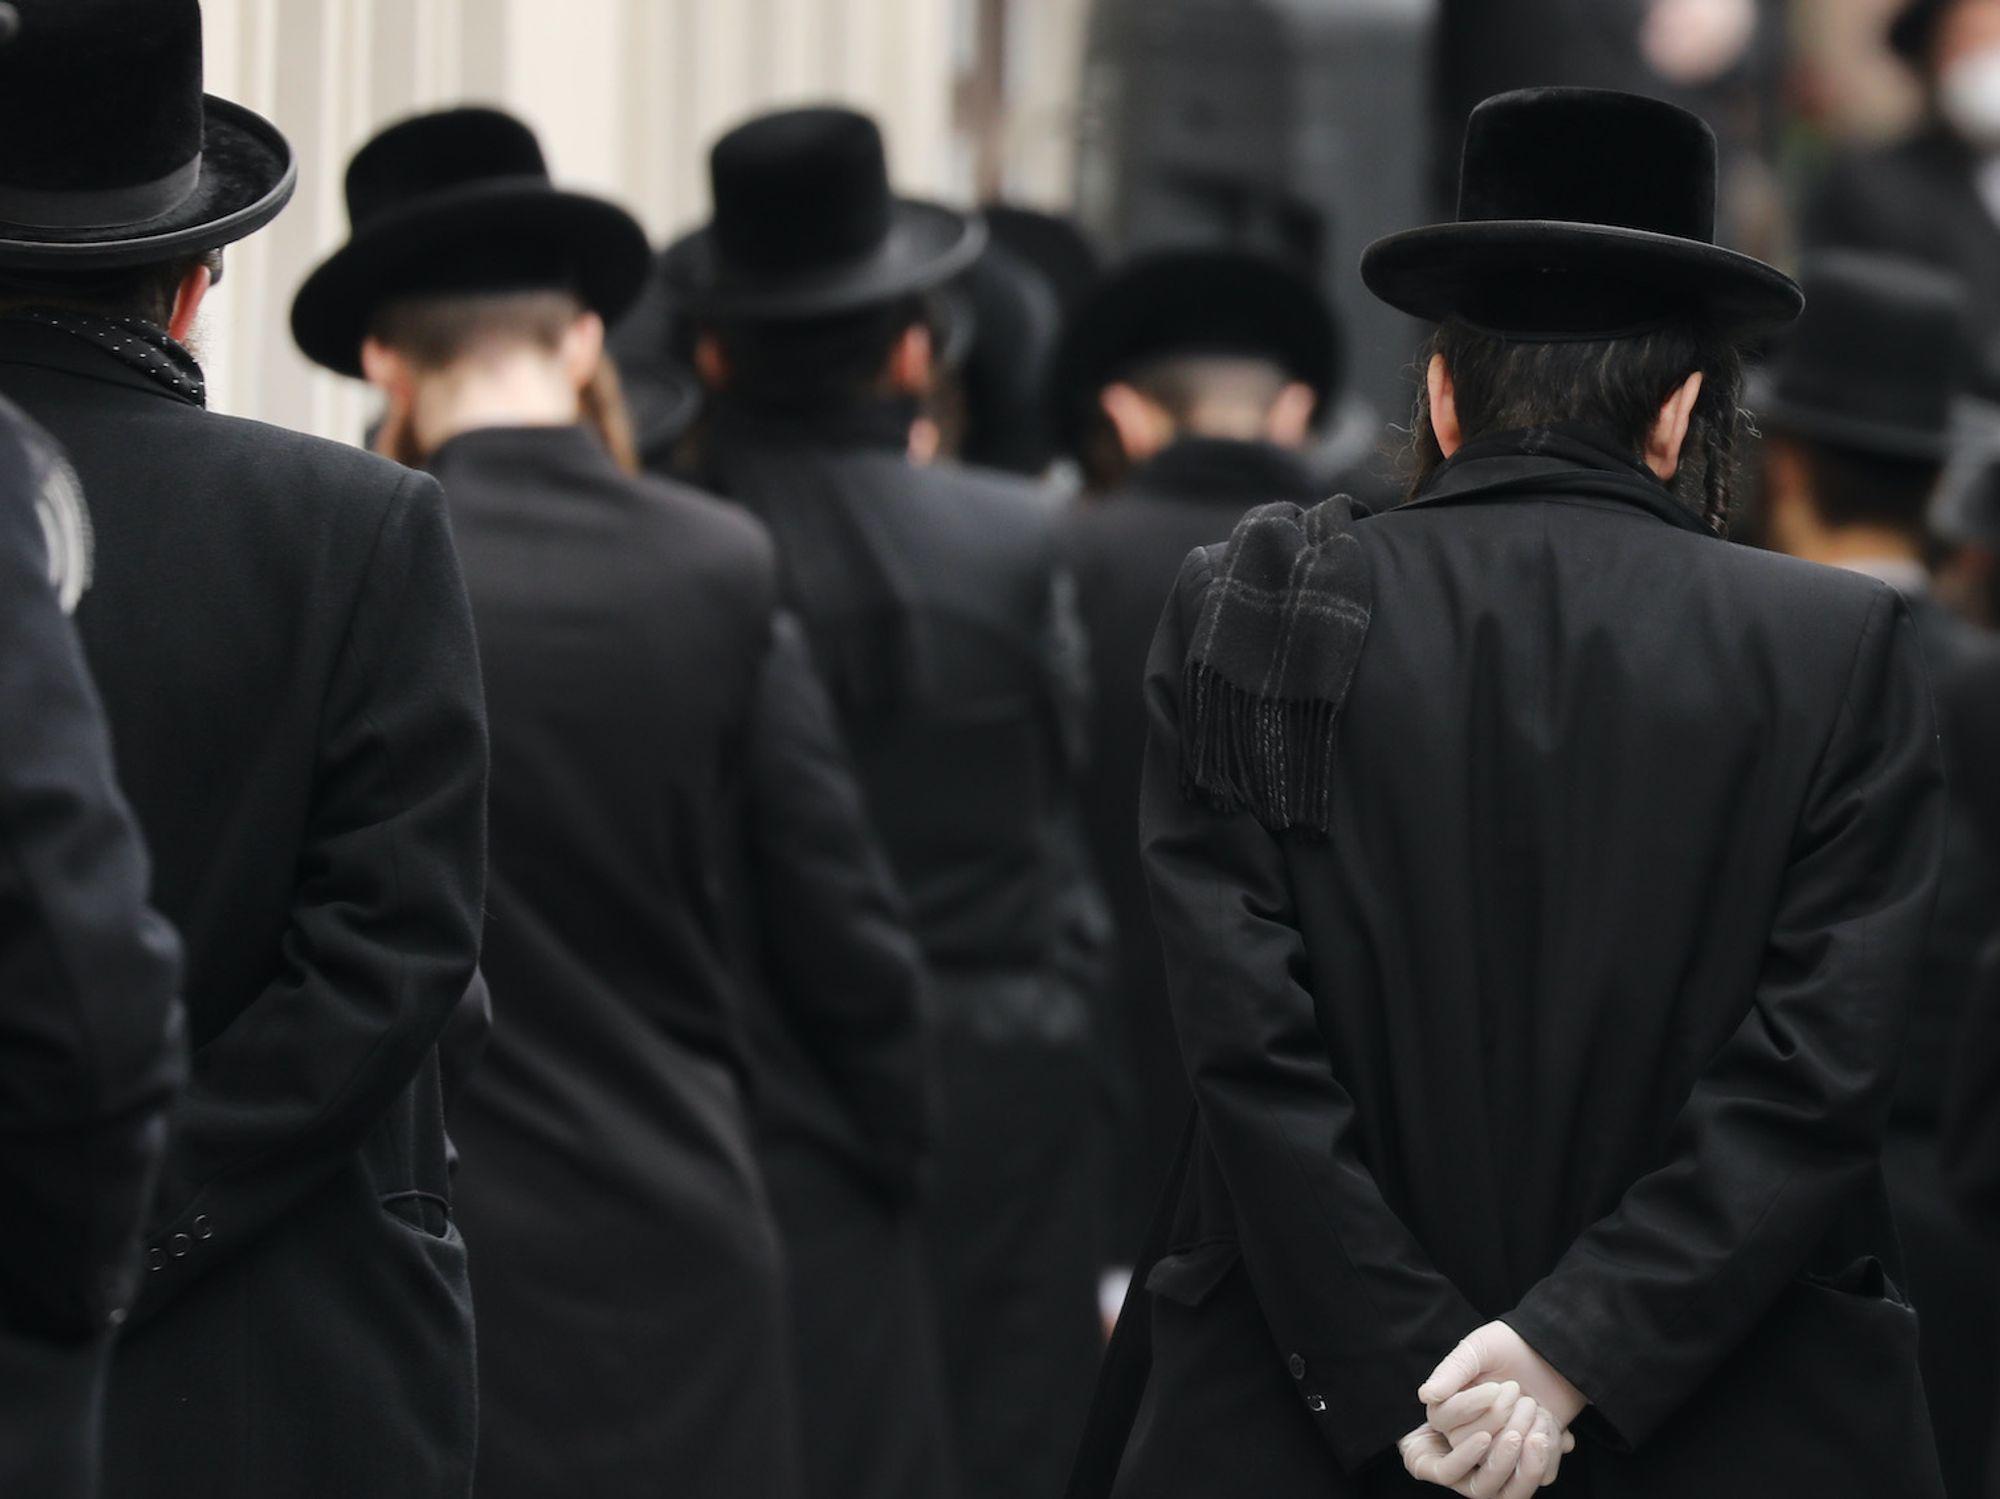 Rabbi who pushed Brooklyn's Jewish community to follow 'draconian' coronavirus lockdown rules dies of COVID-19